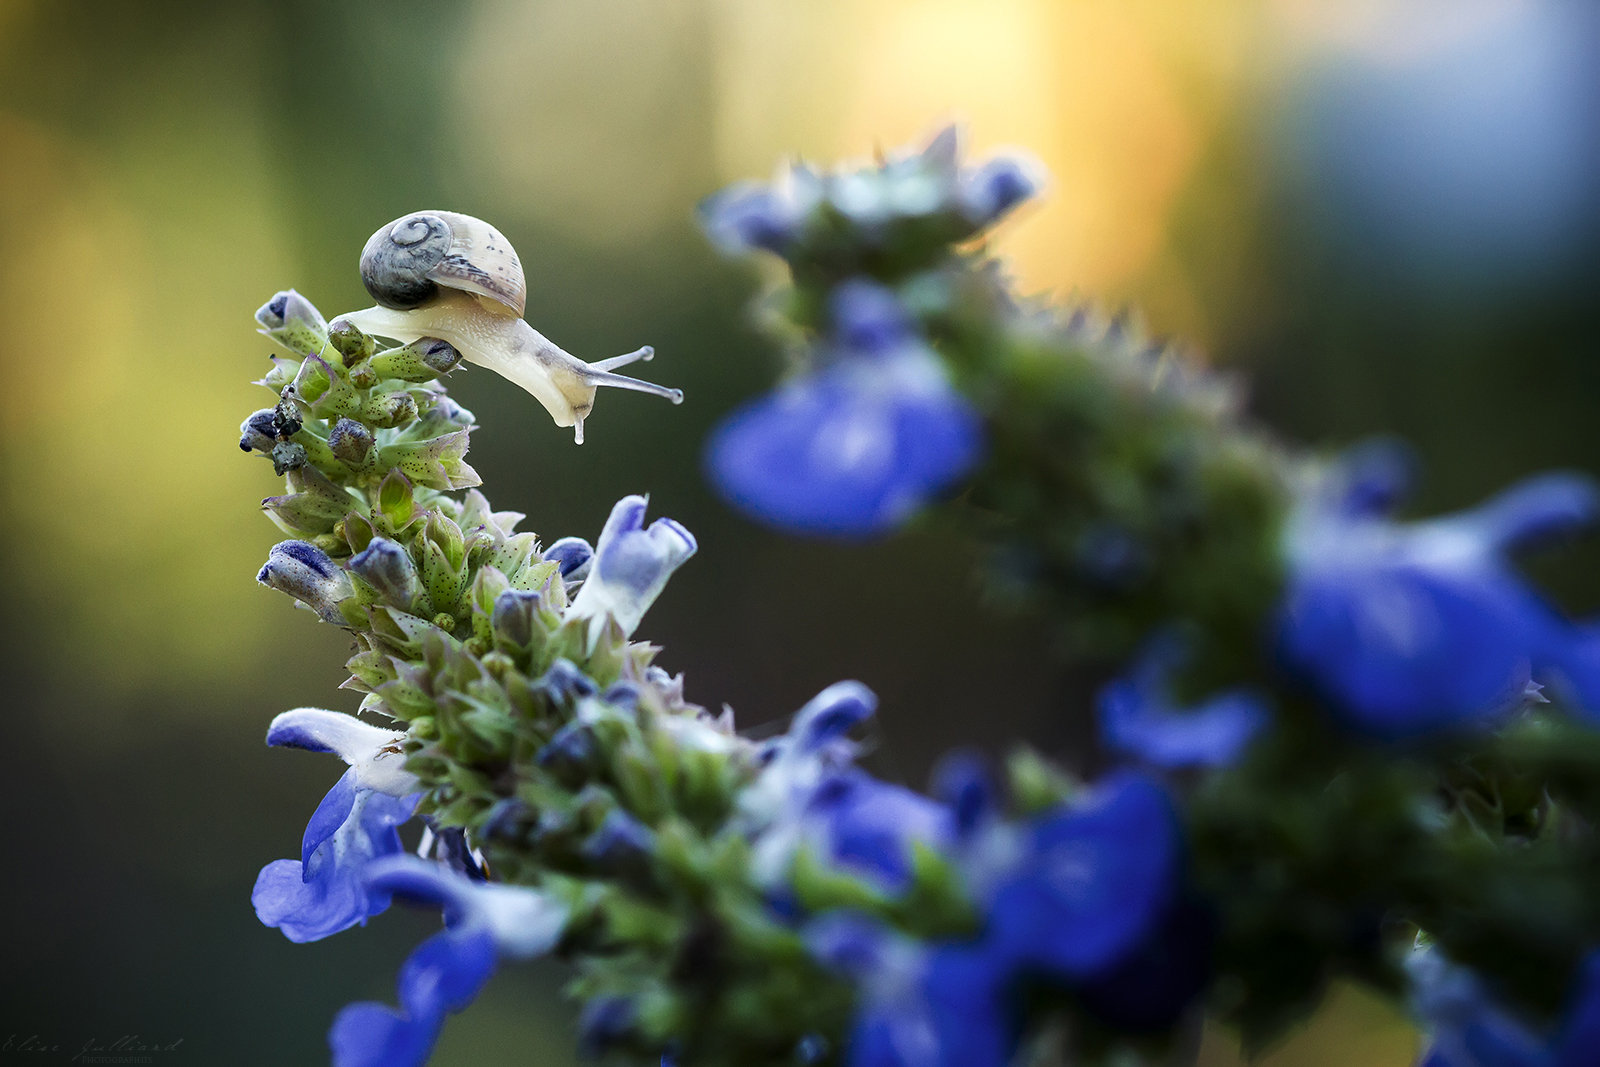 elise-julliard-photographe-photo-escargot-gasteropode-sur-fleurs-lyon